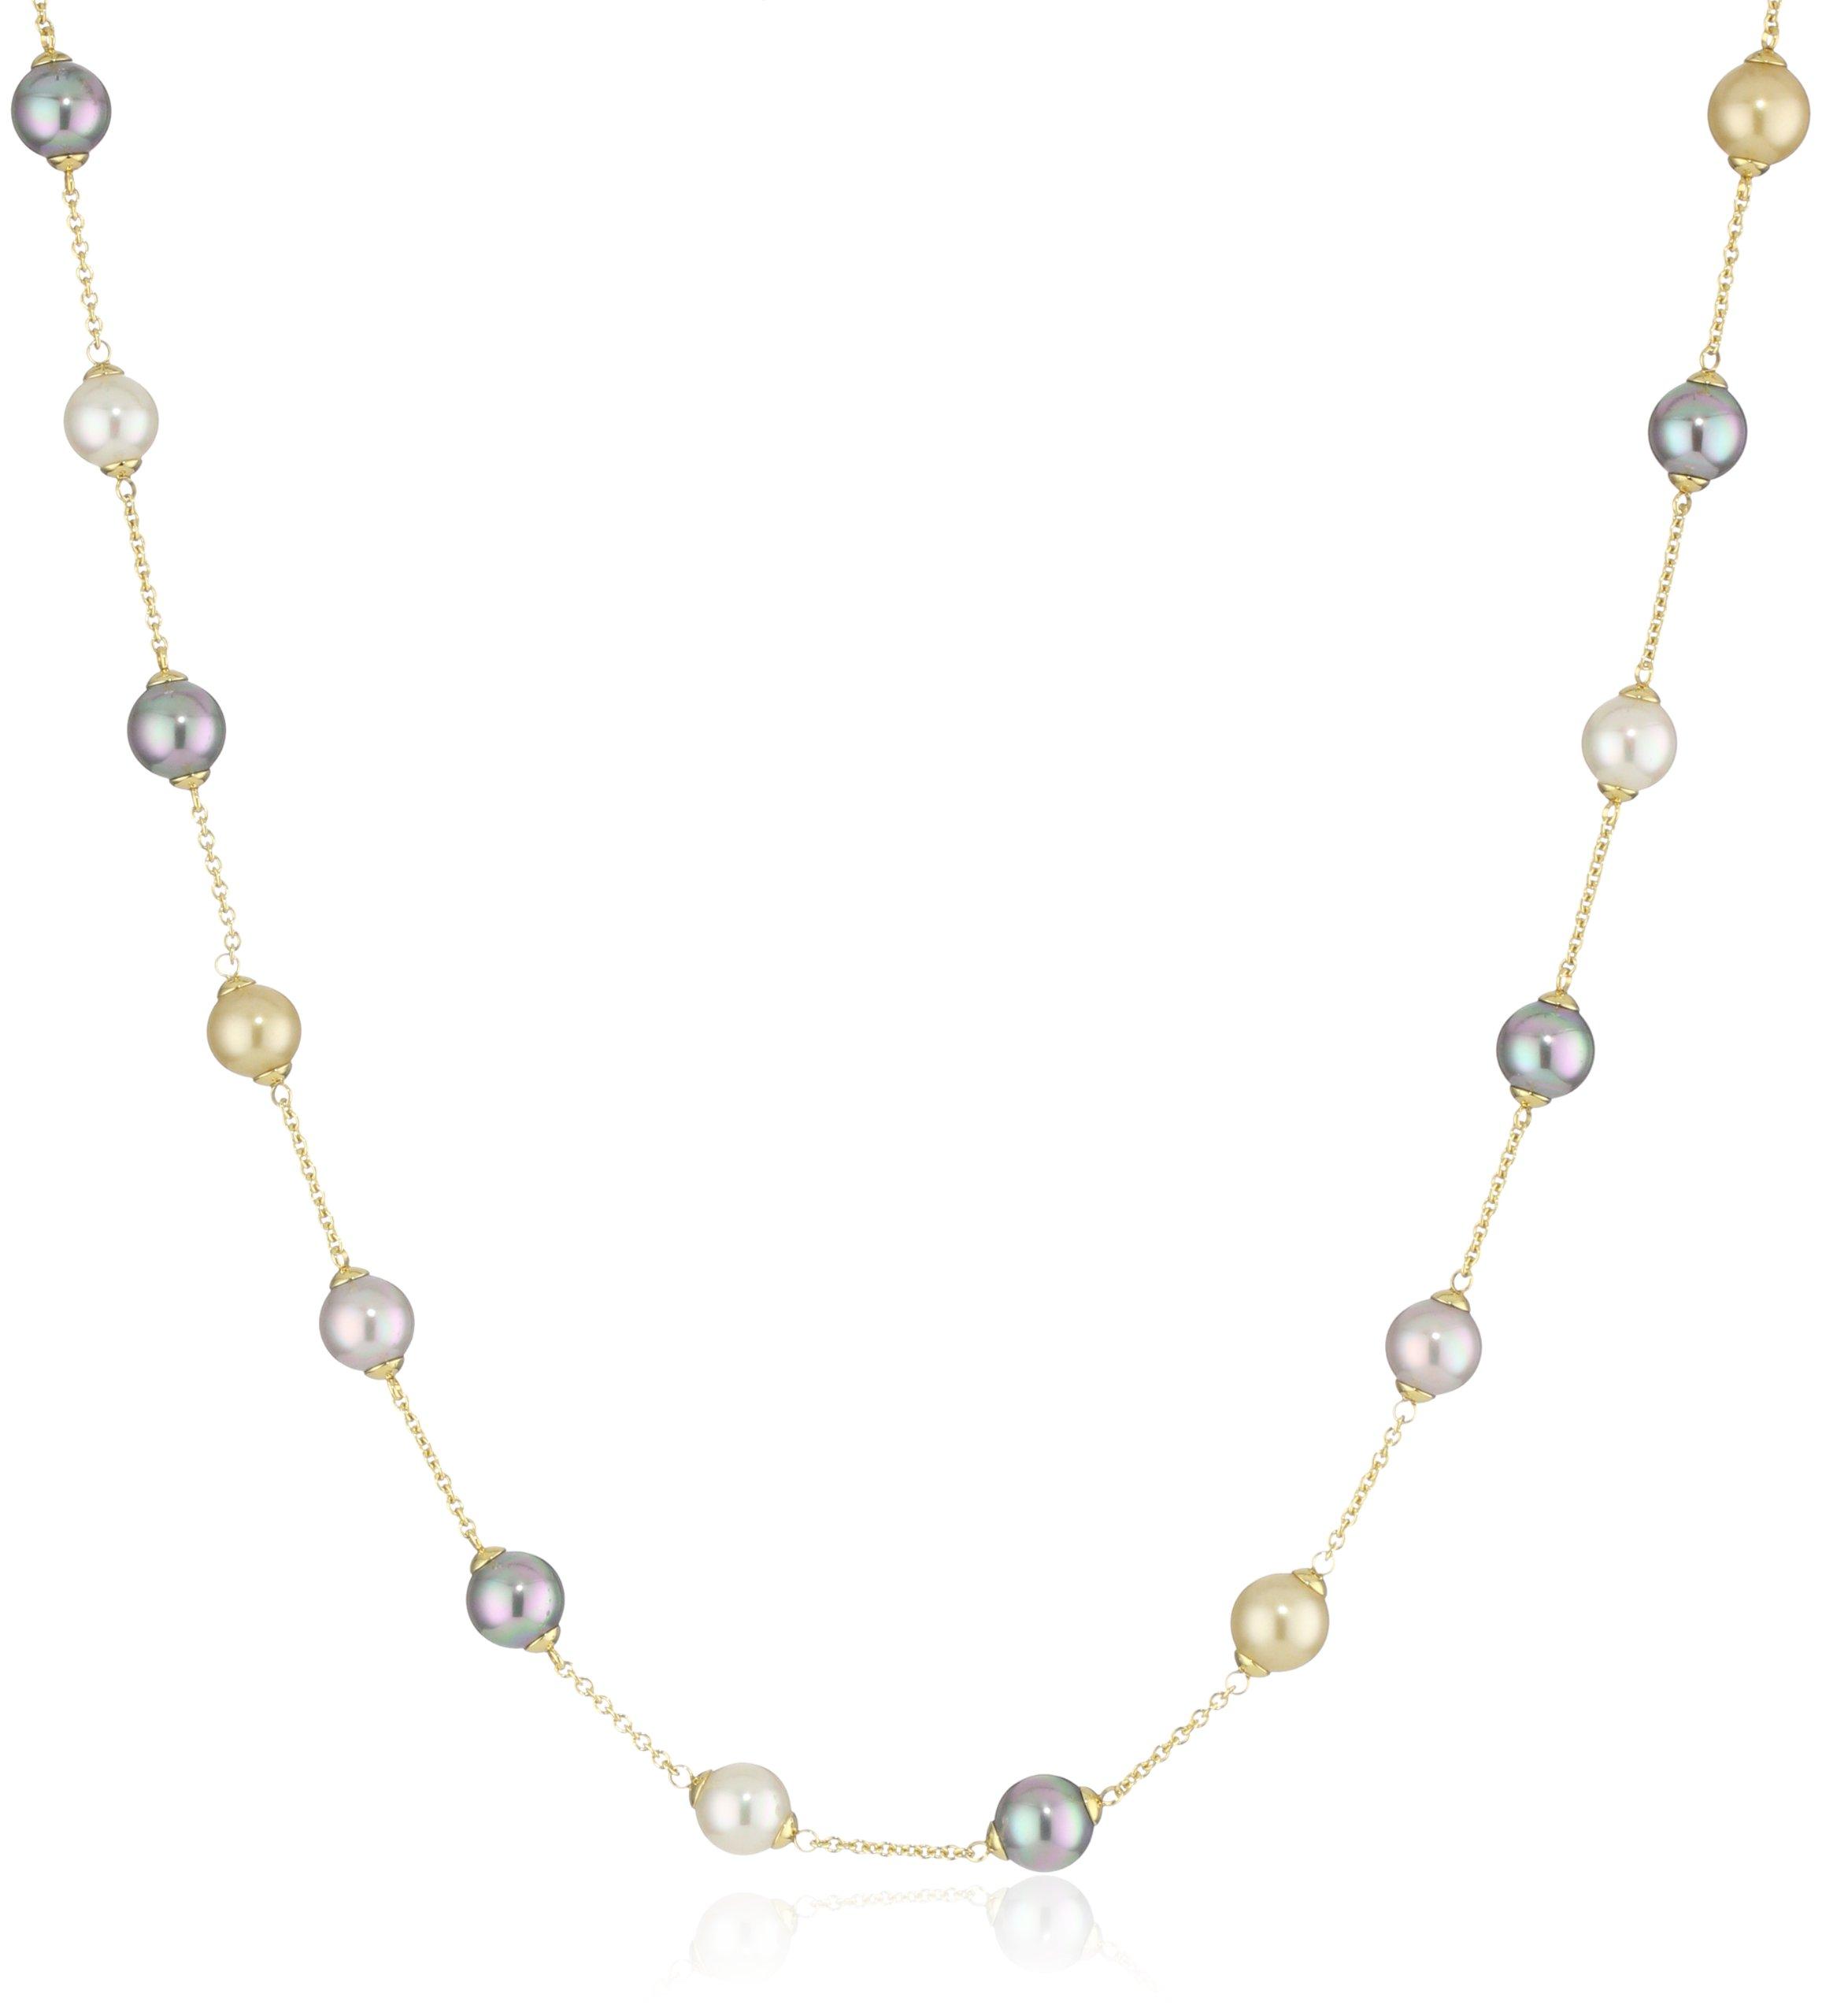 Majorica Vermeil 8mm Multi-Round Pearls Station Necklace, 18''